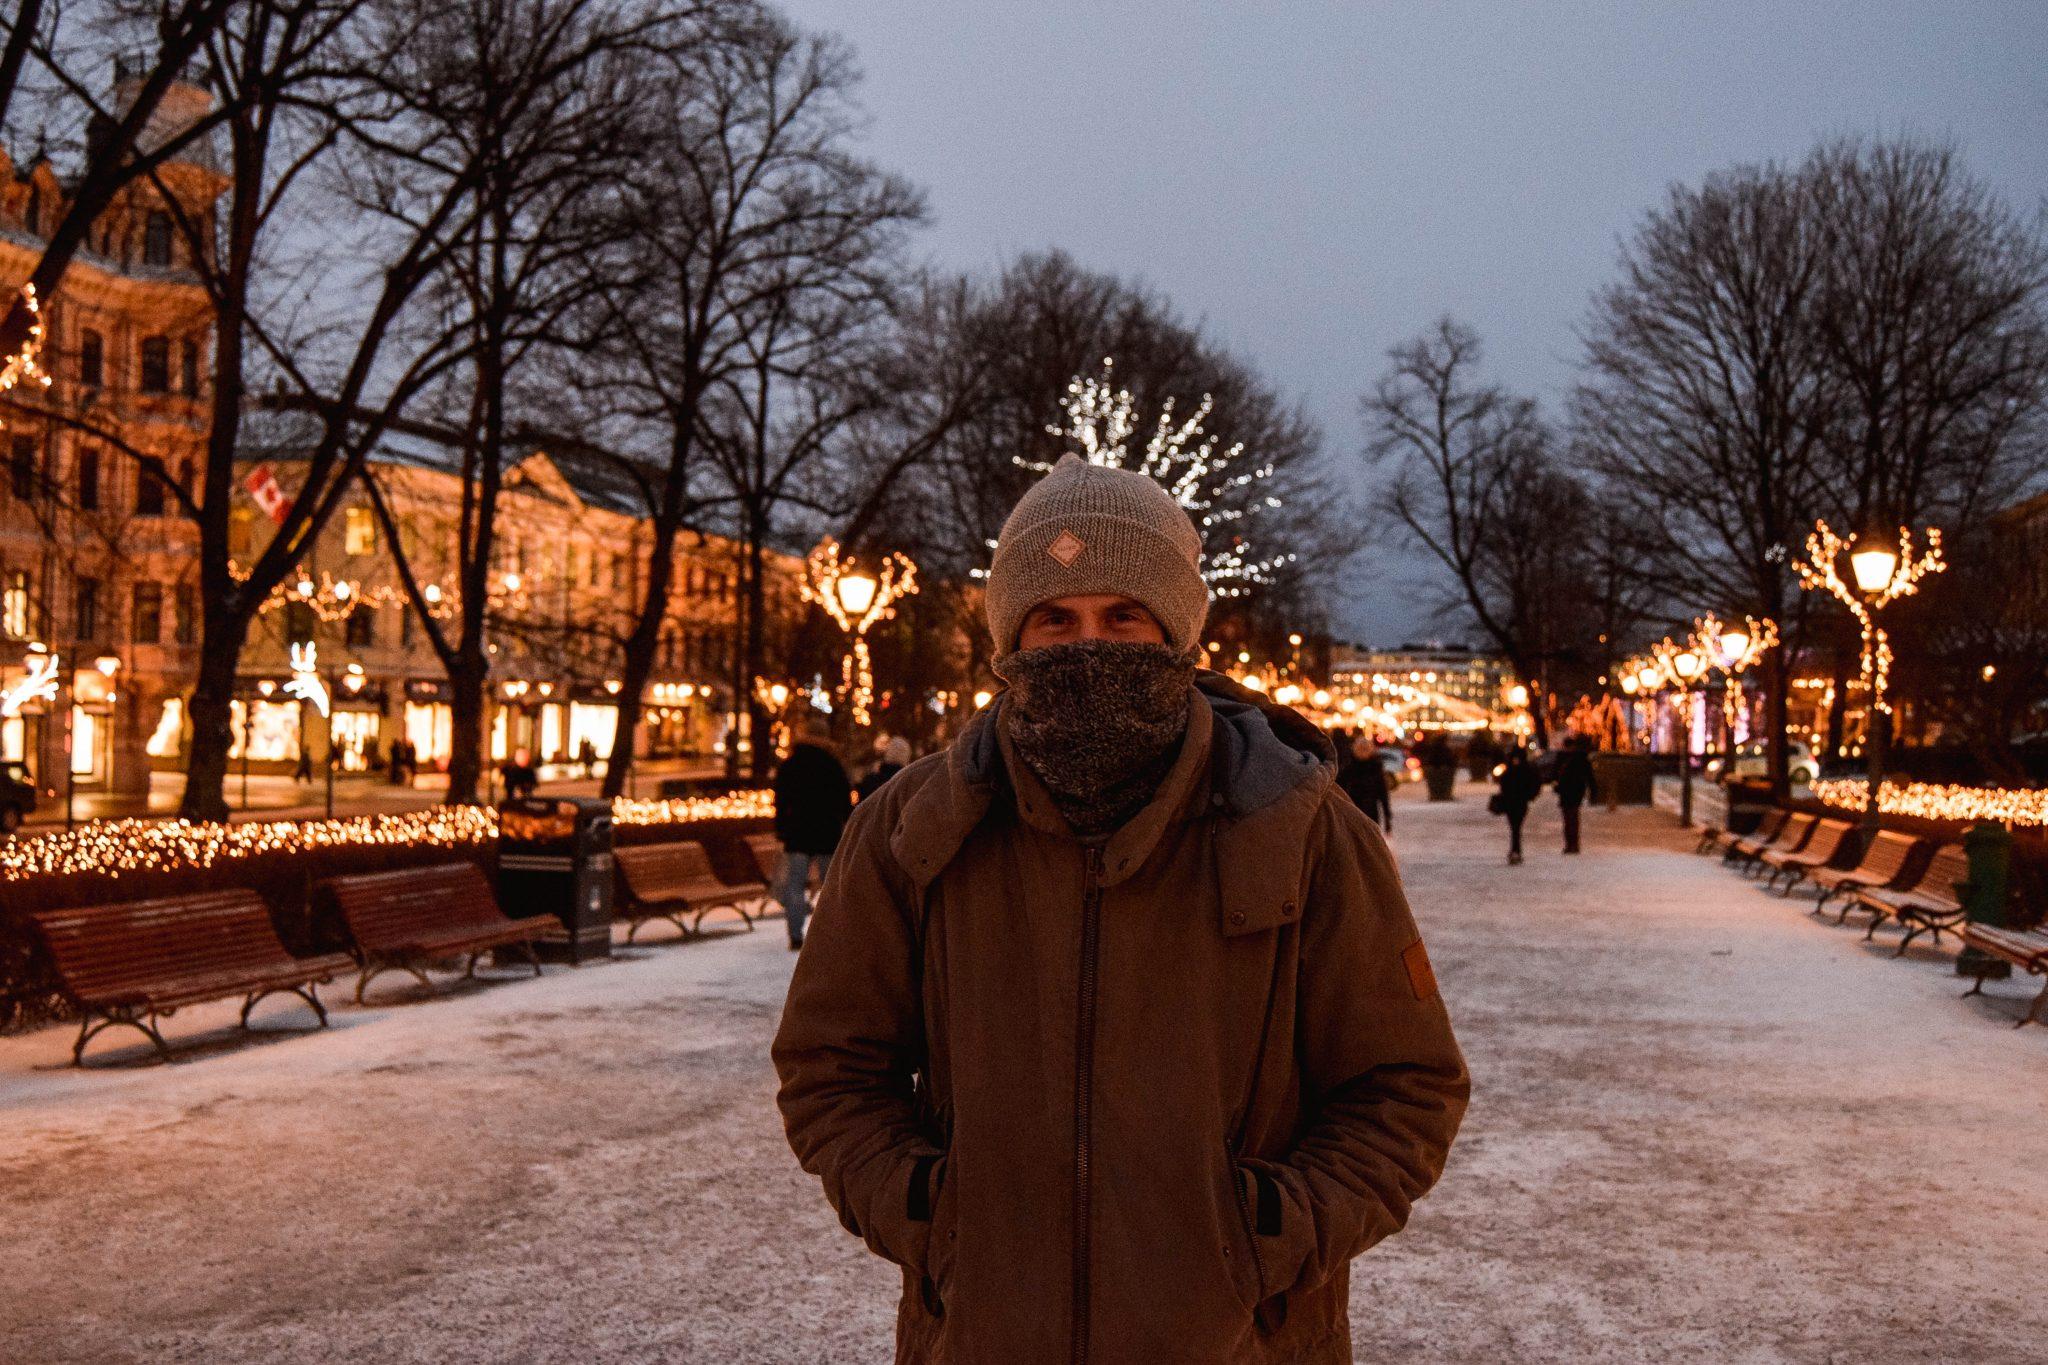 Things To Do In Helsinki In Winter - Esplanade Park Helsinki Esplanadi